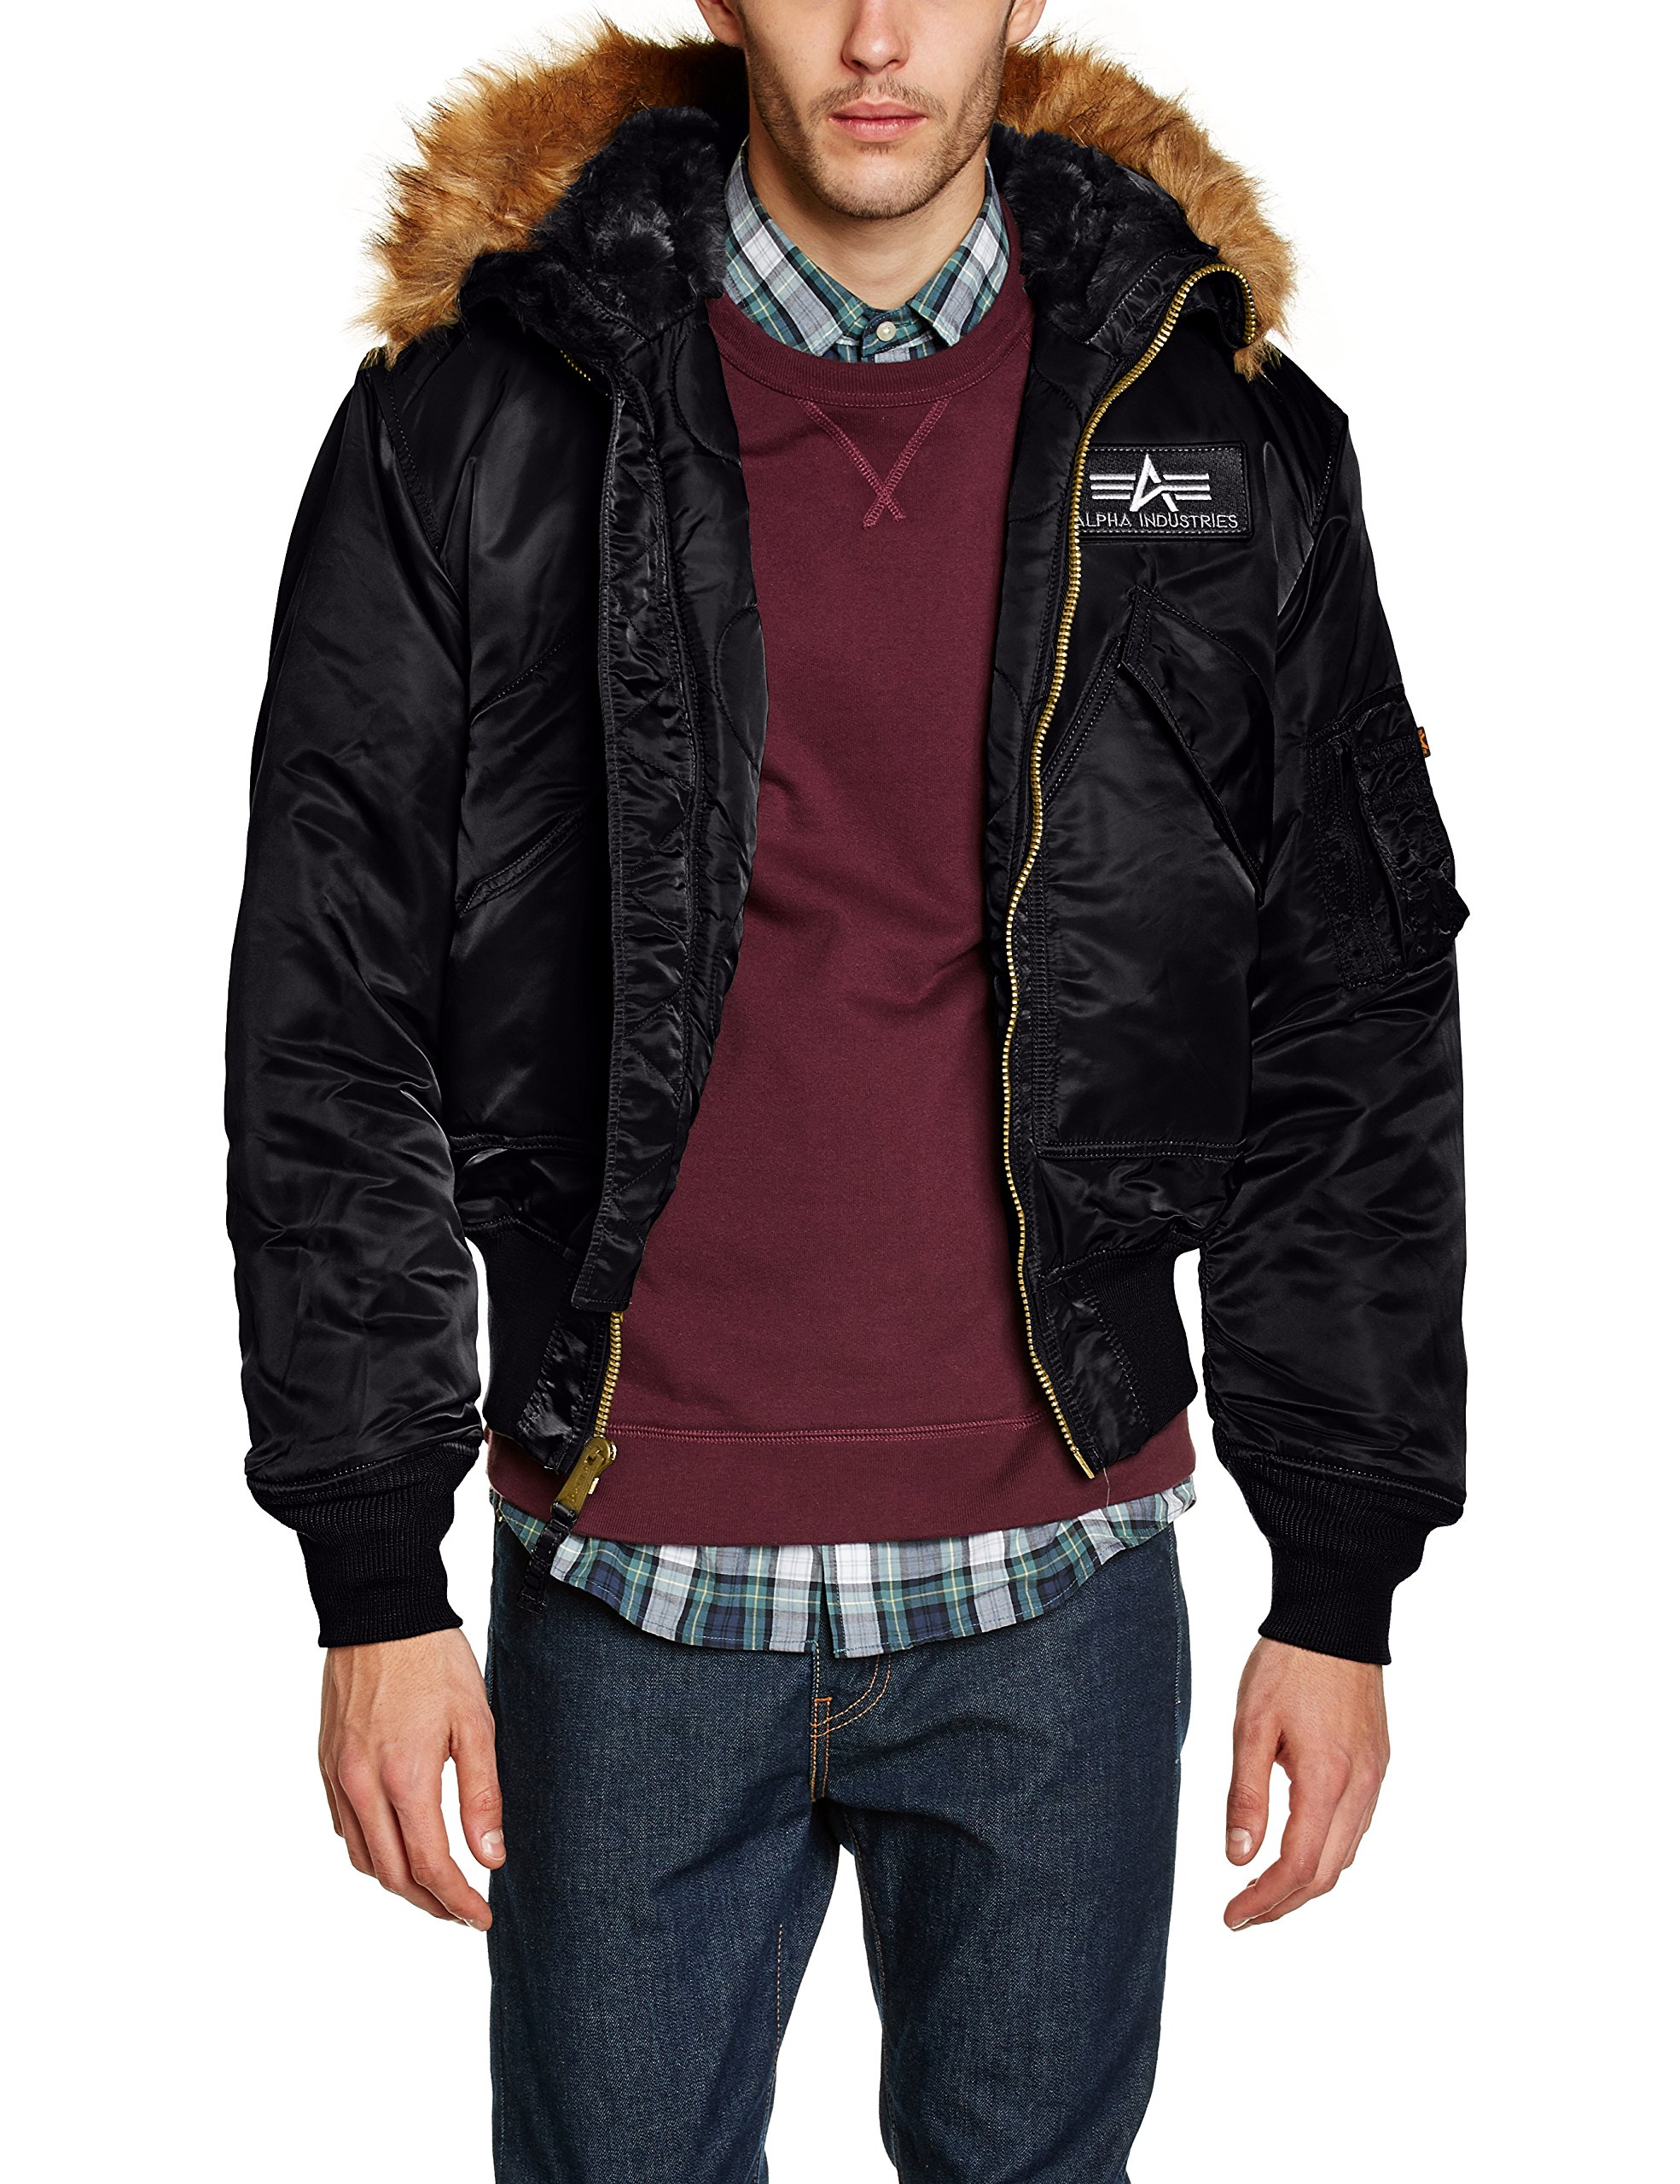 45 large P Alpha saison Hooded Veste Mi Industries BlackNoirblackXxx 8n0PwkOX